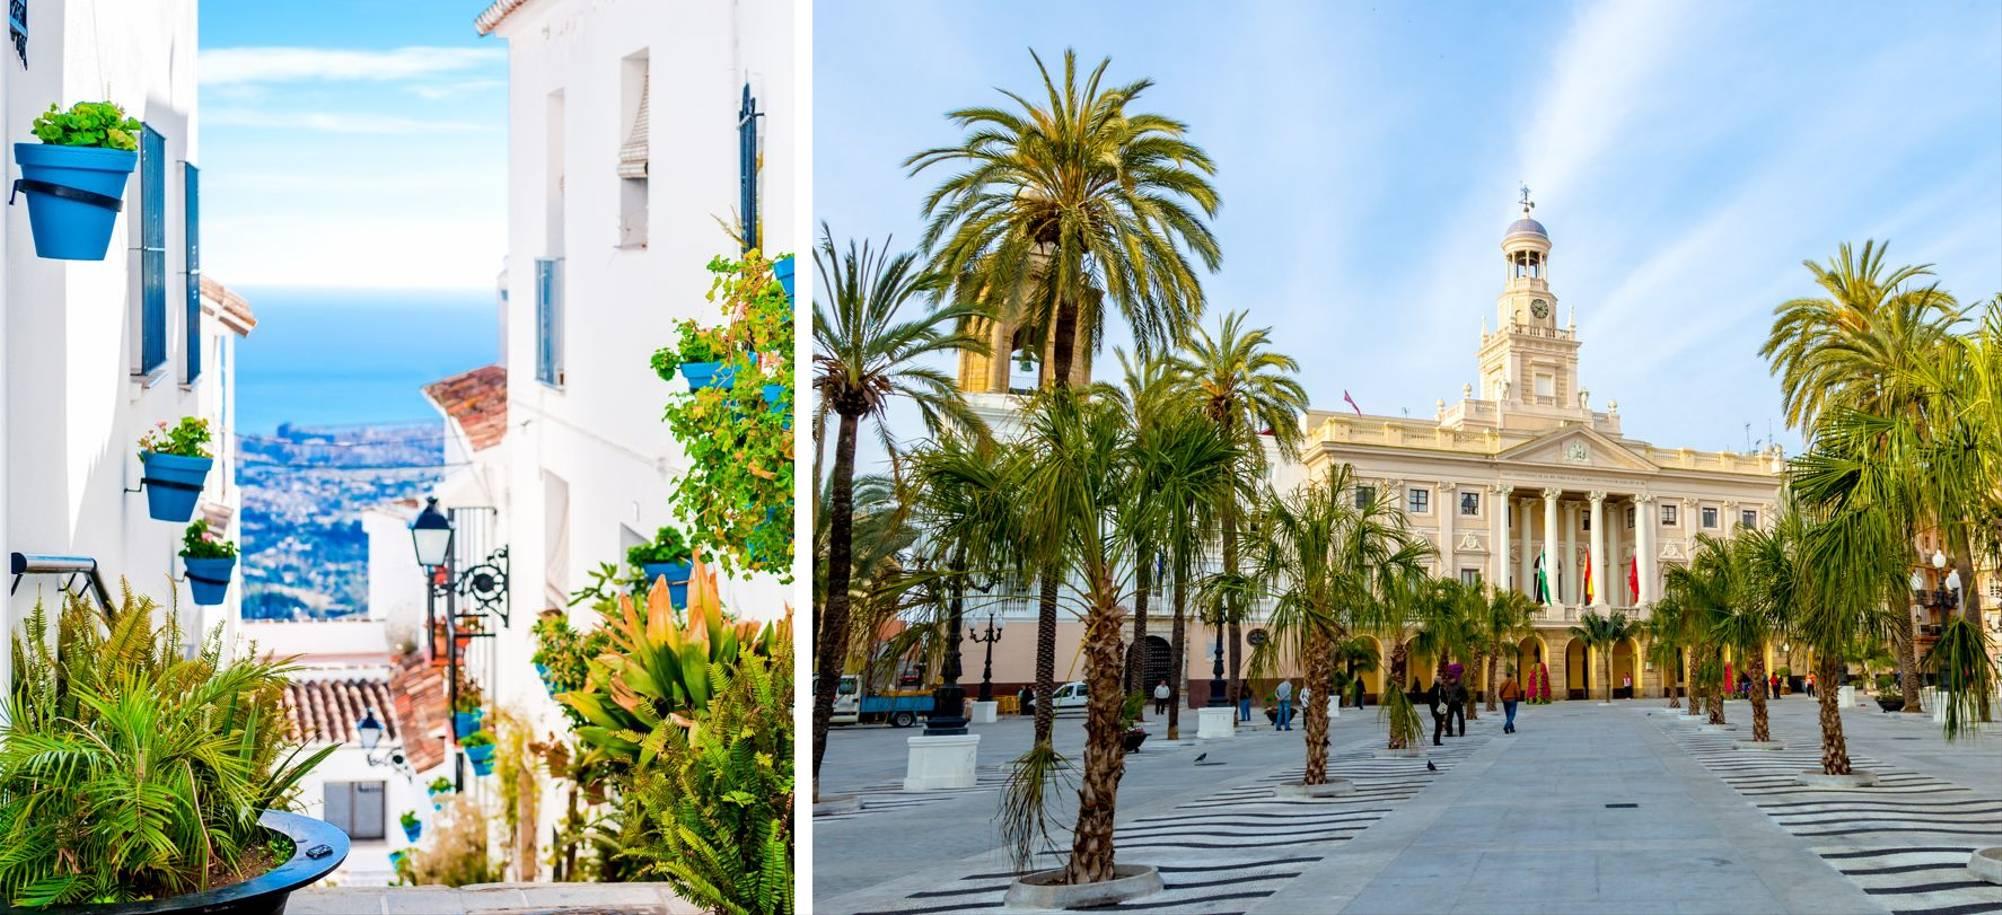 6 Day - Cadiz, Spains - Itinerary Desktop.jpg